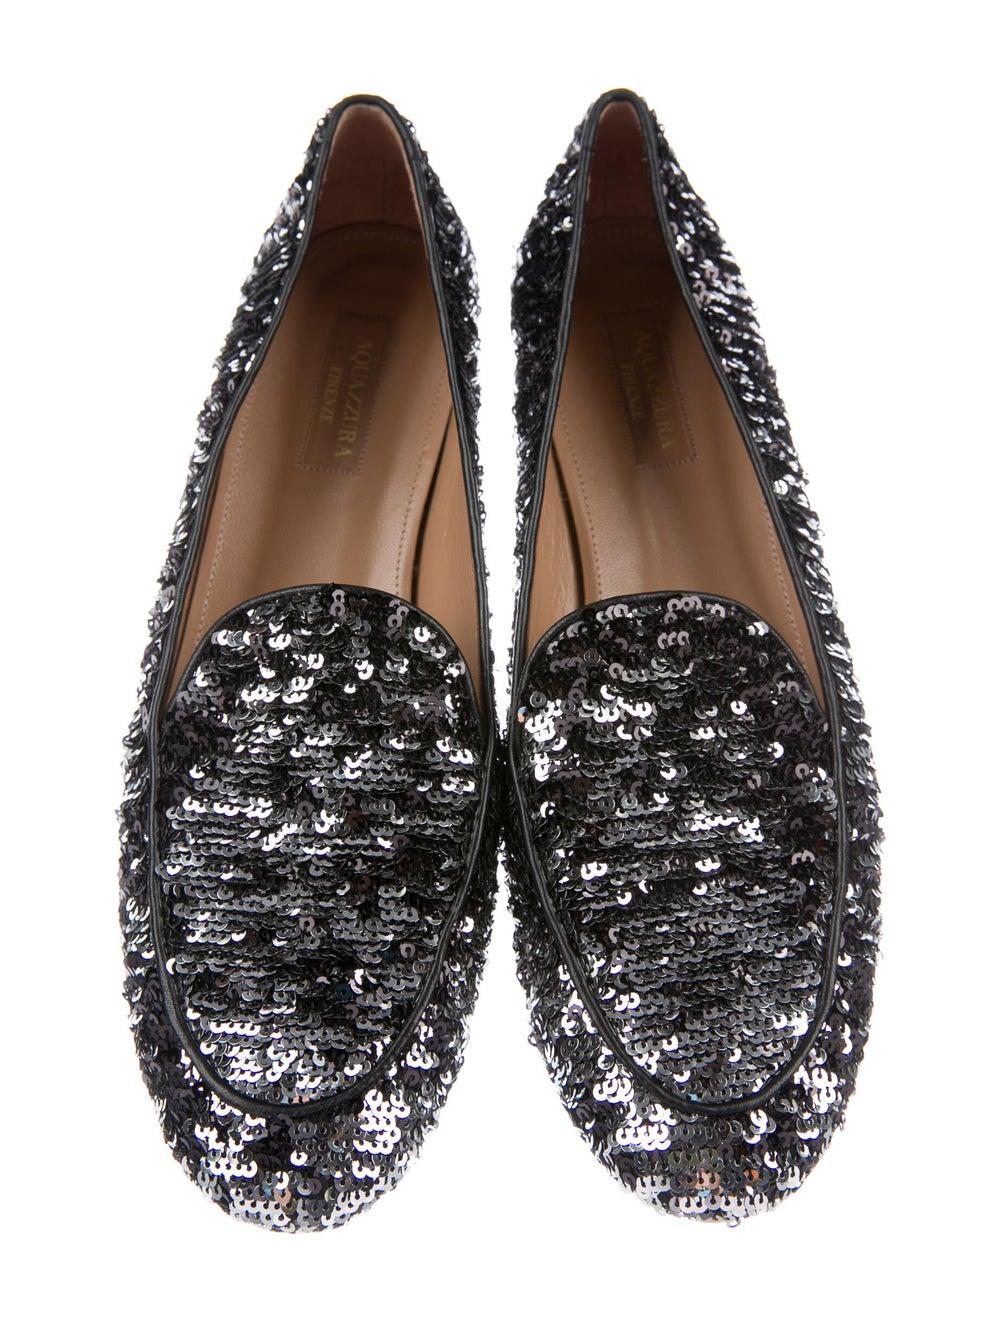 Aquazzura Loafers Black - image 3